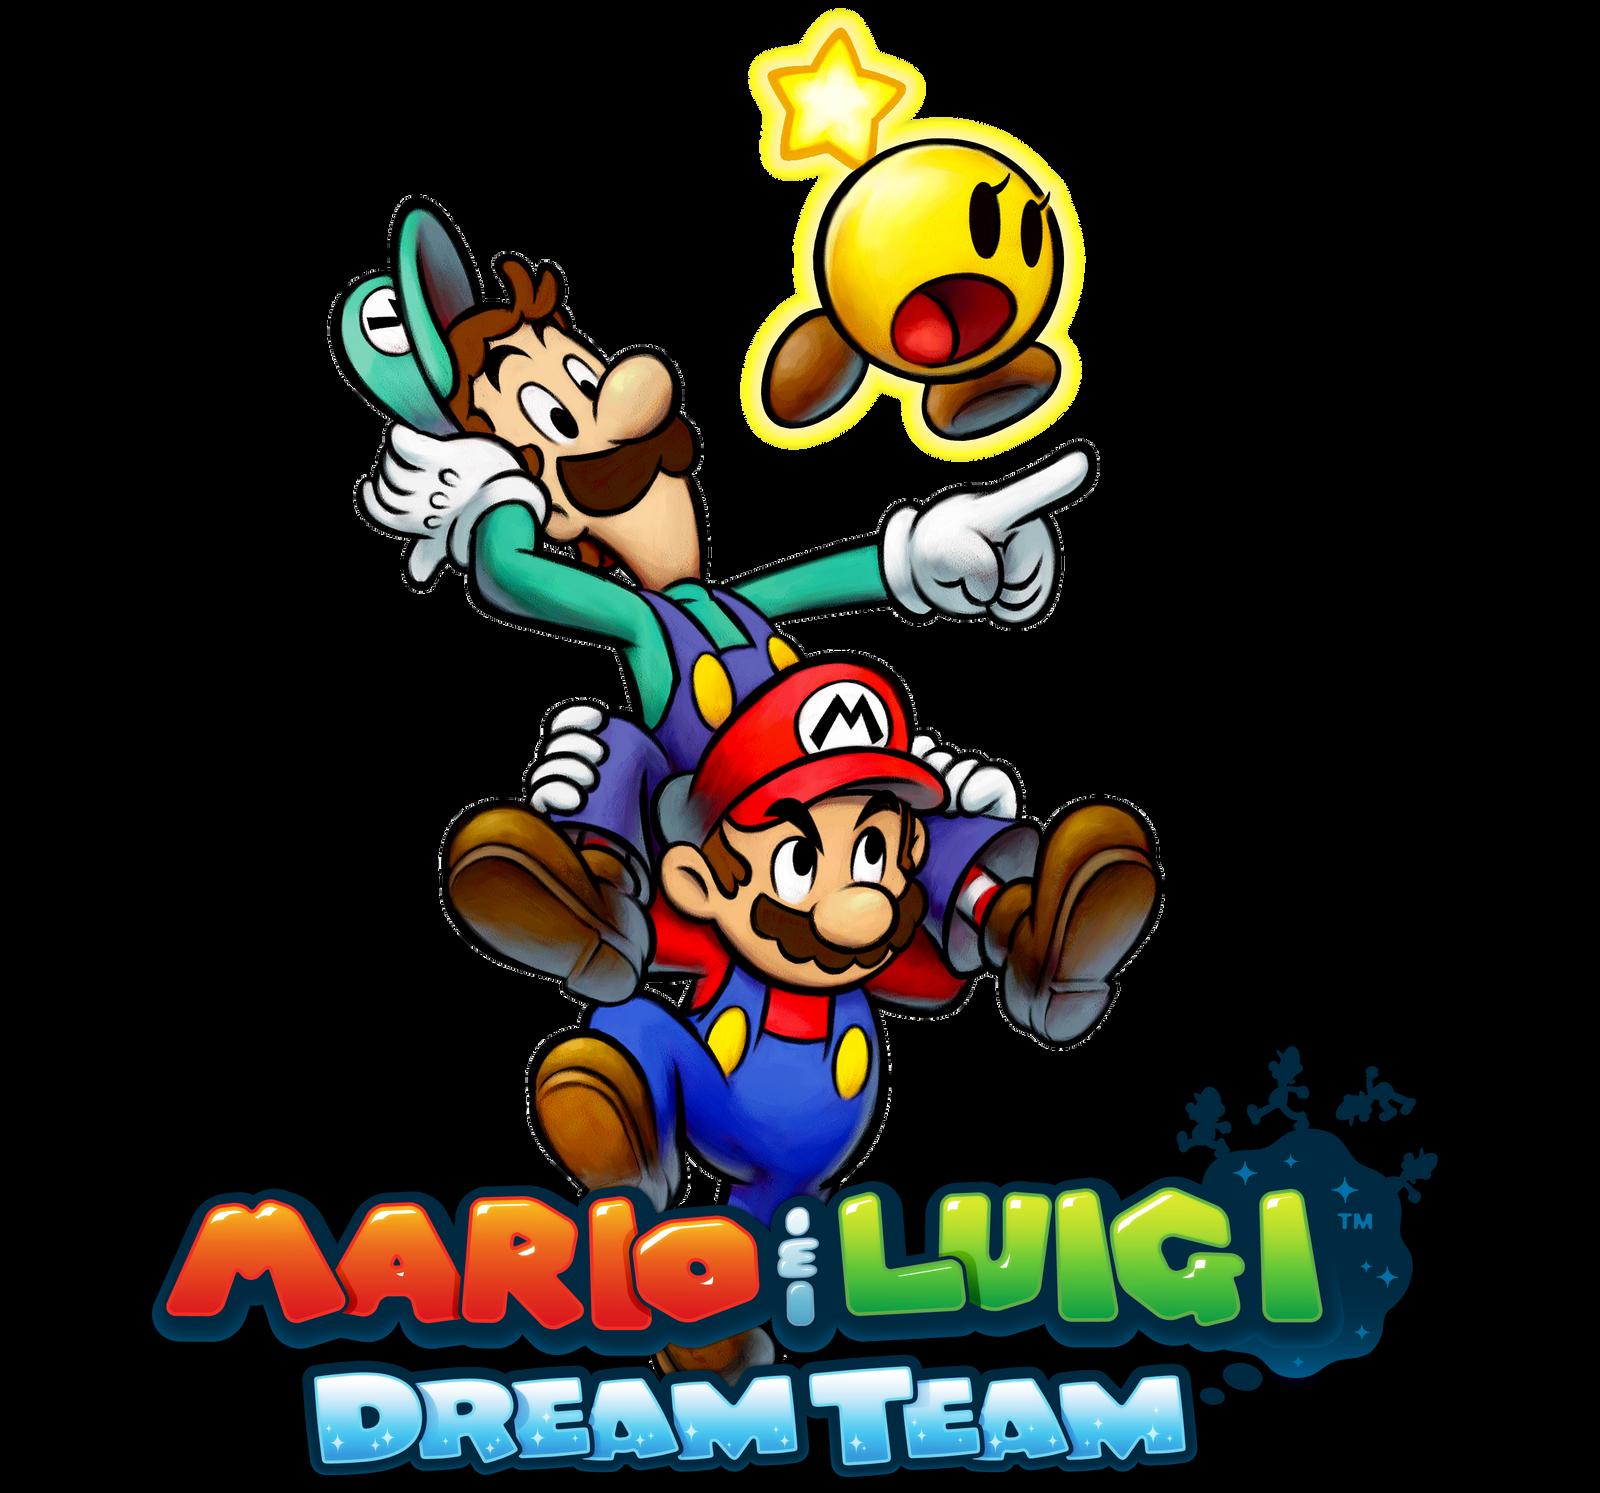 Mario and luigi dream team by legend tony980 on deviantart mario and luigi dream team by legend tony980 altavistaventures Gallery